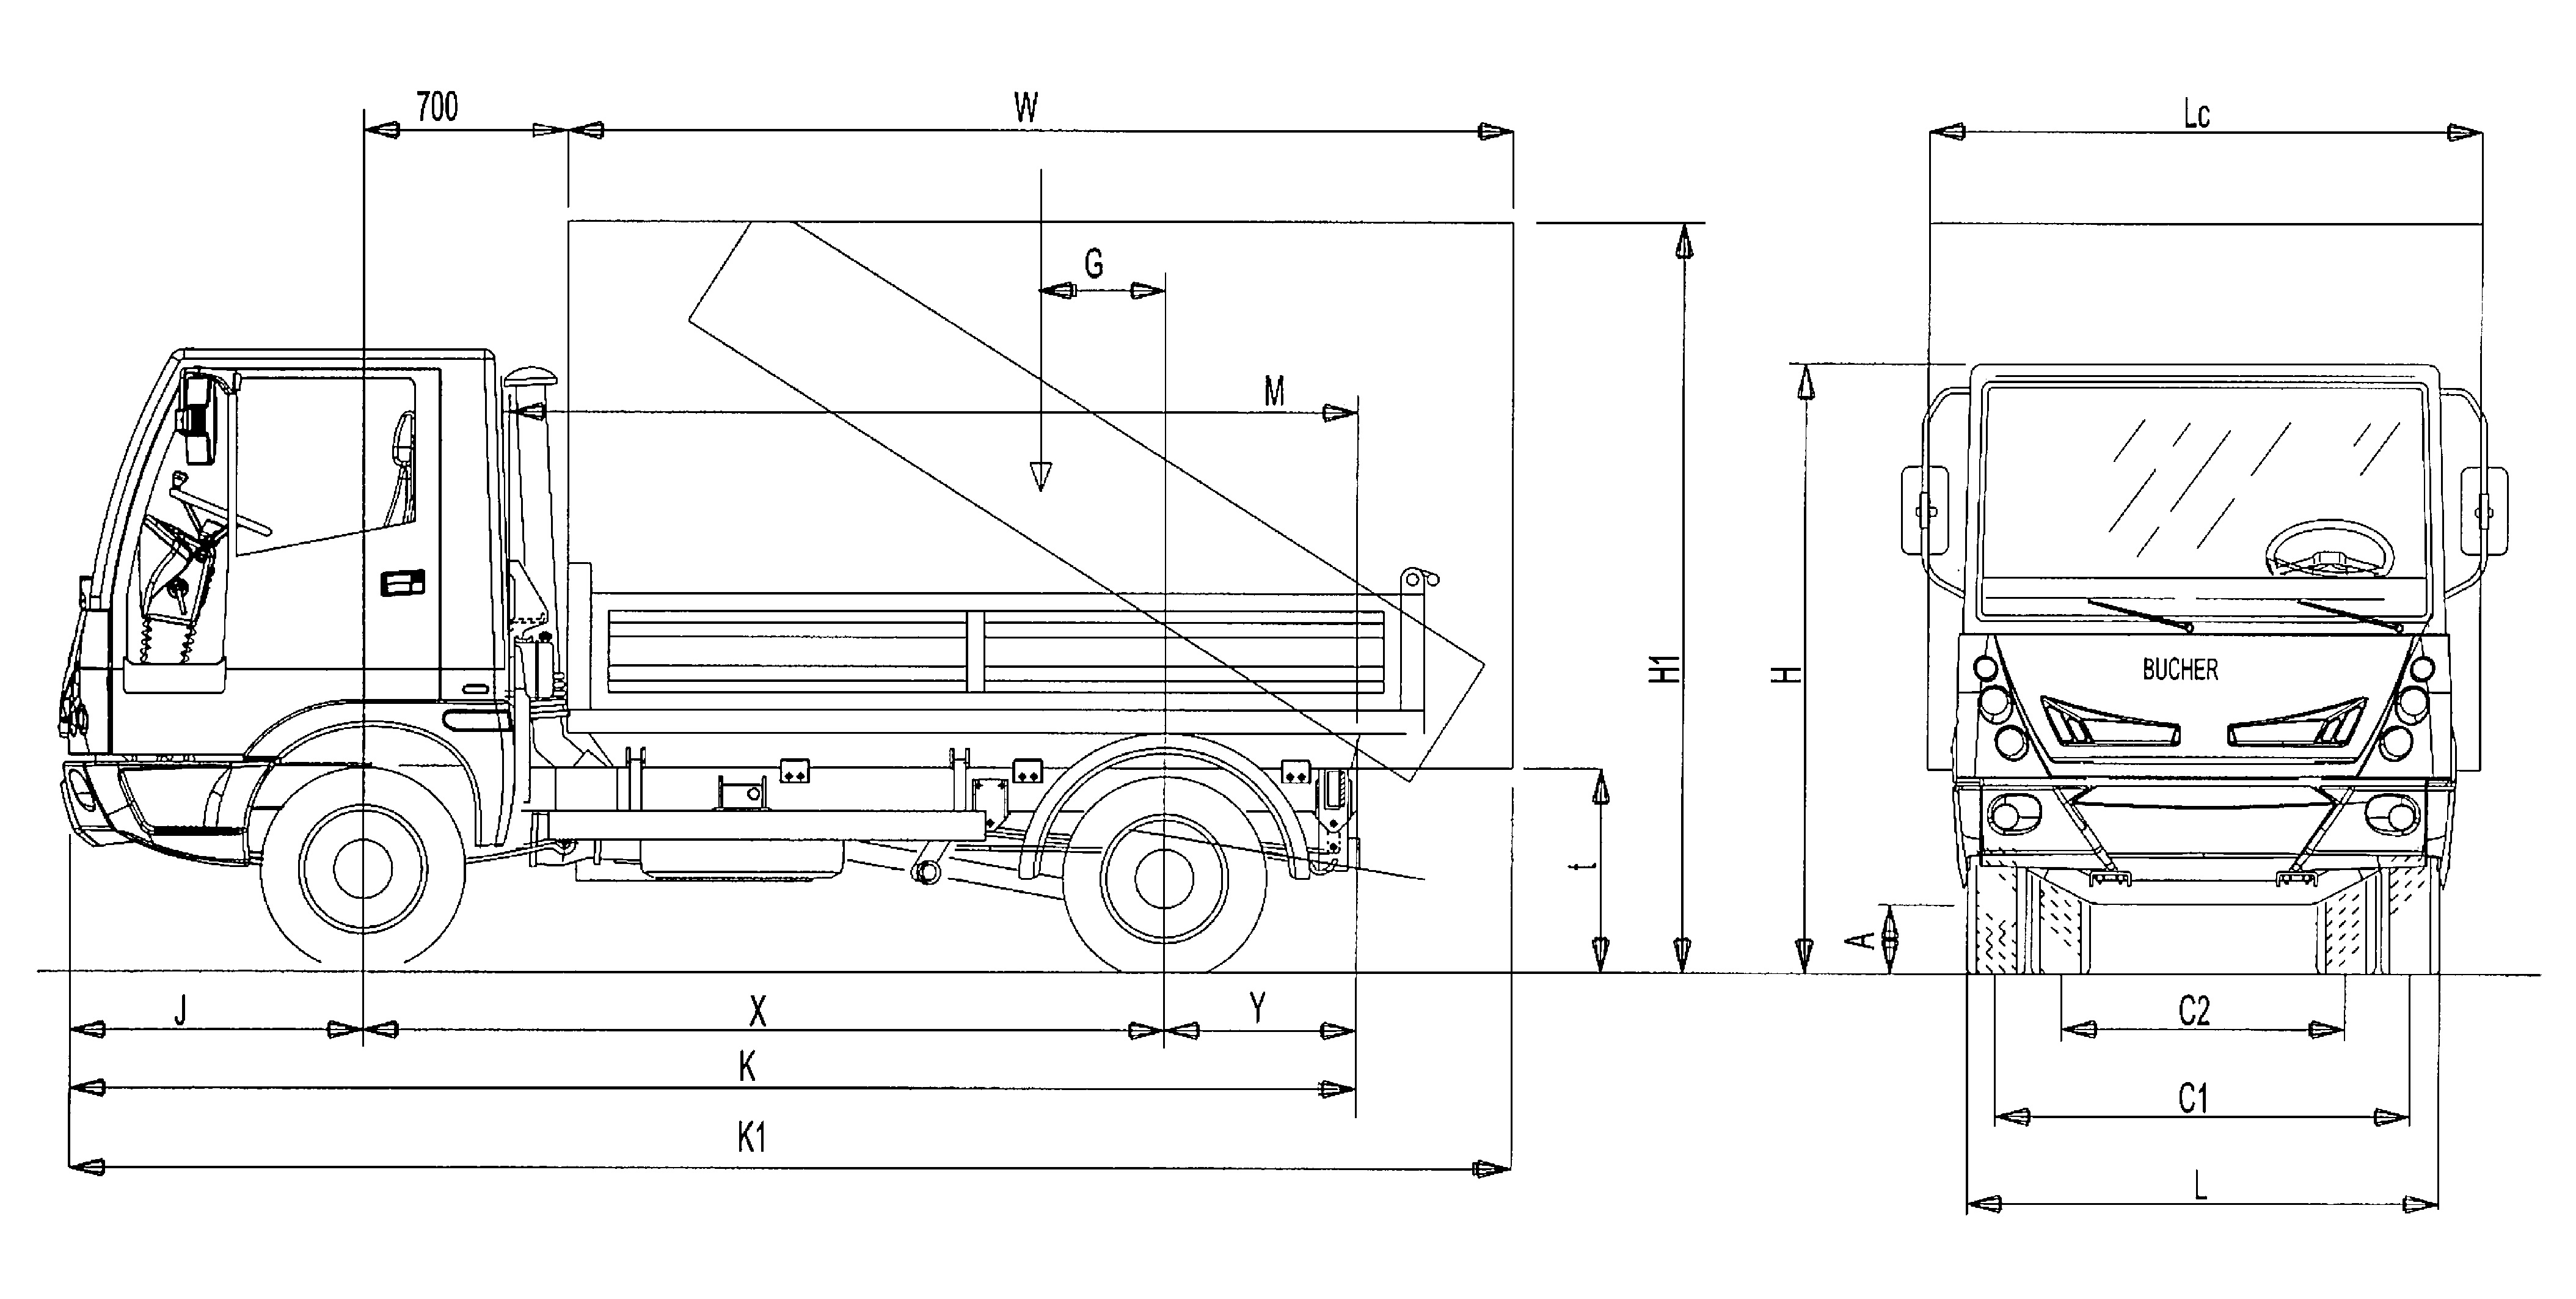 bucher sch u00f6rling presenta la nuova serie di veicoli